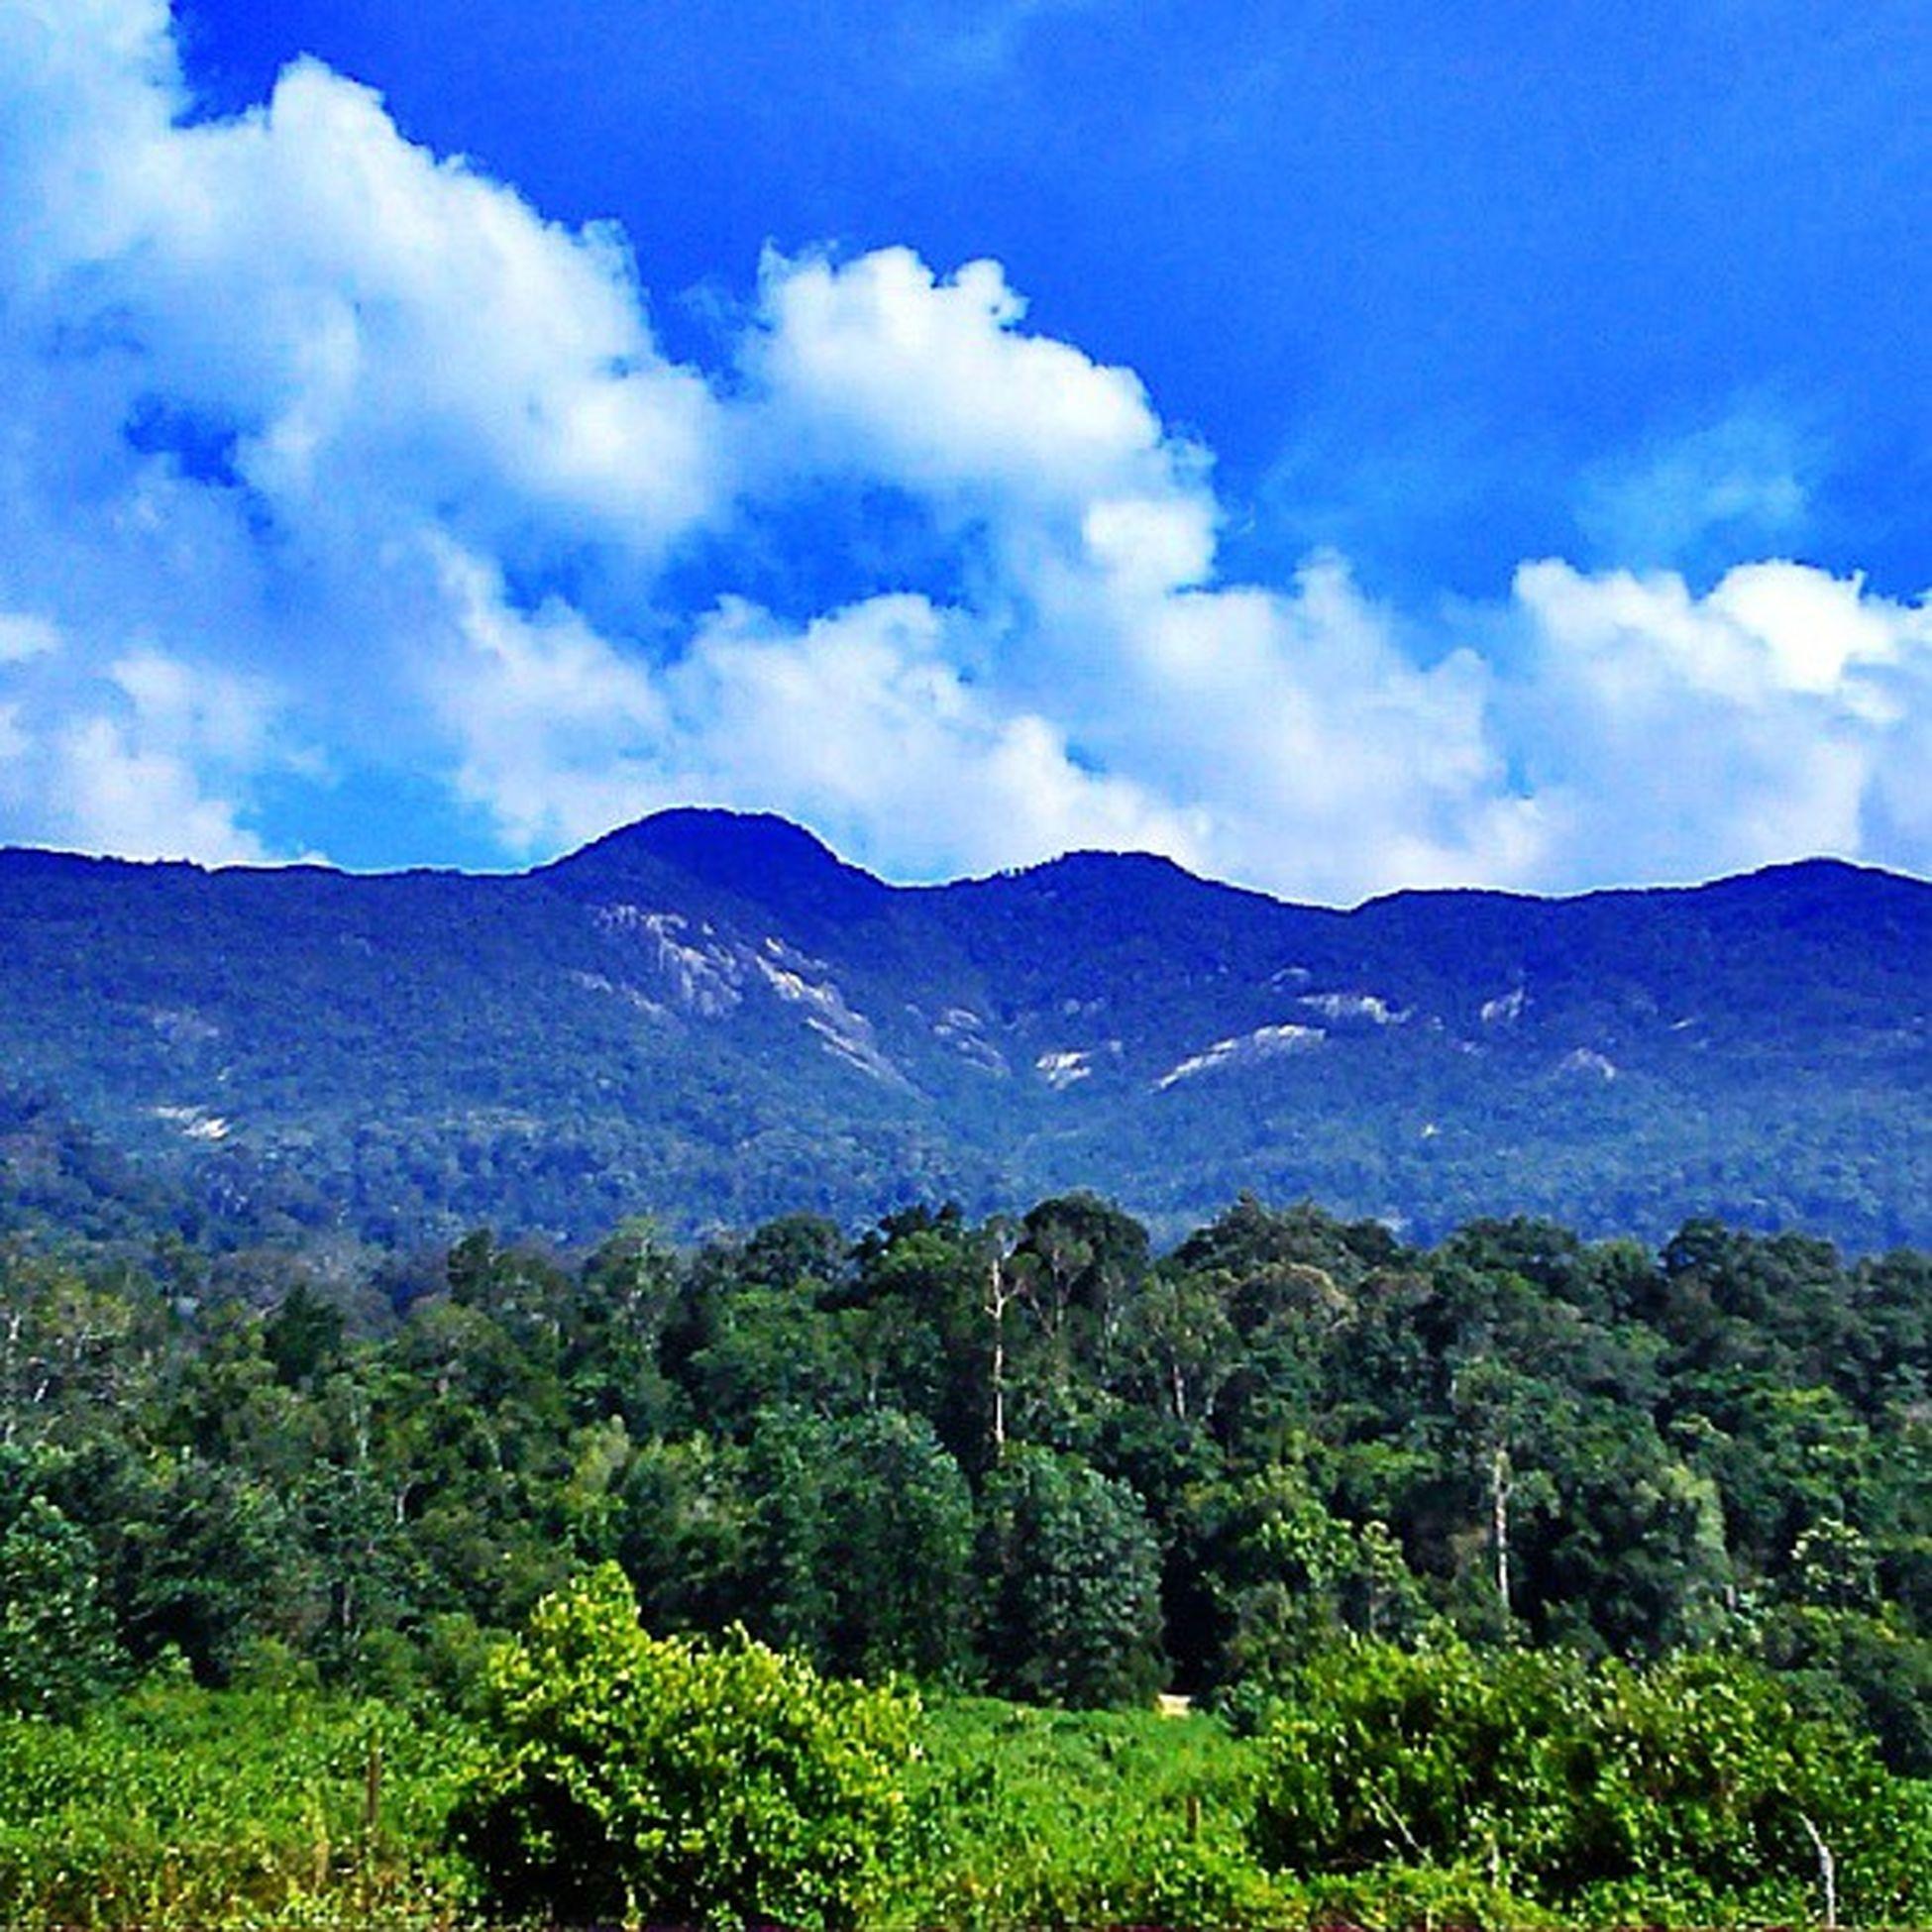 Weekend Mount Ledang Climbing extremesportswaterfallswimmingenjoylifestylenaturelover